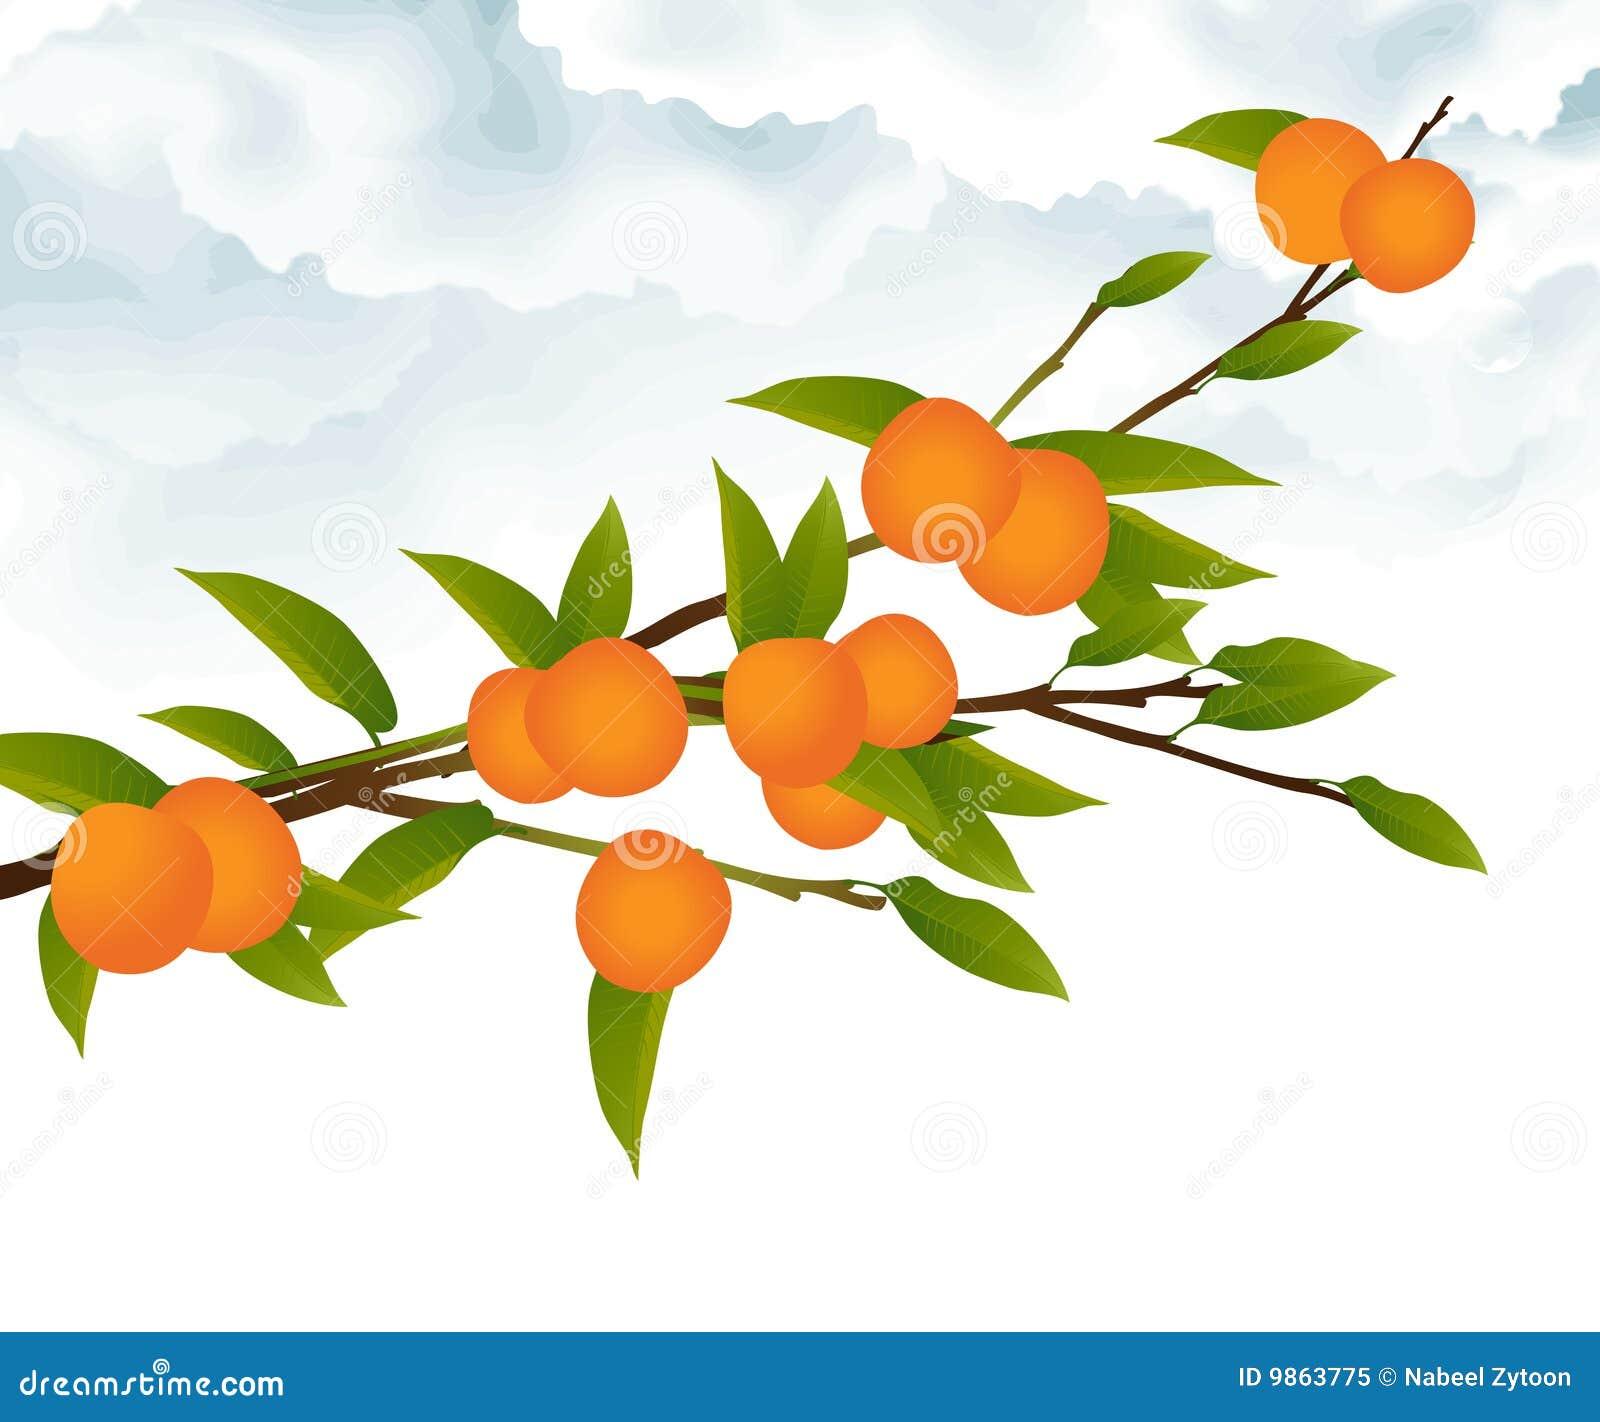 Orange tree branch stock vector. Illustration of green ...